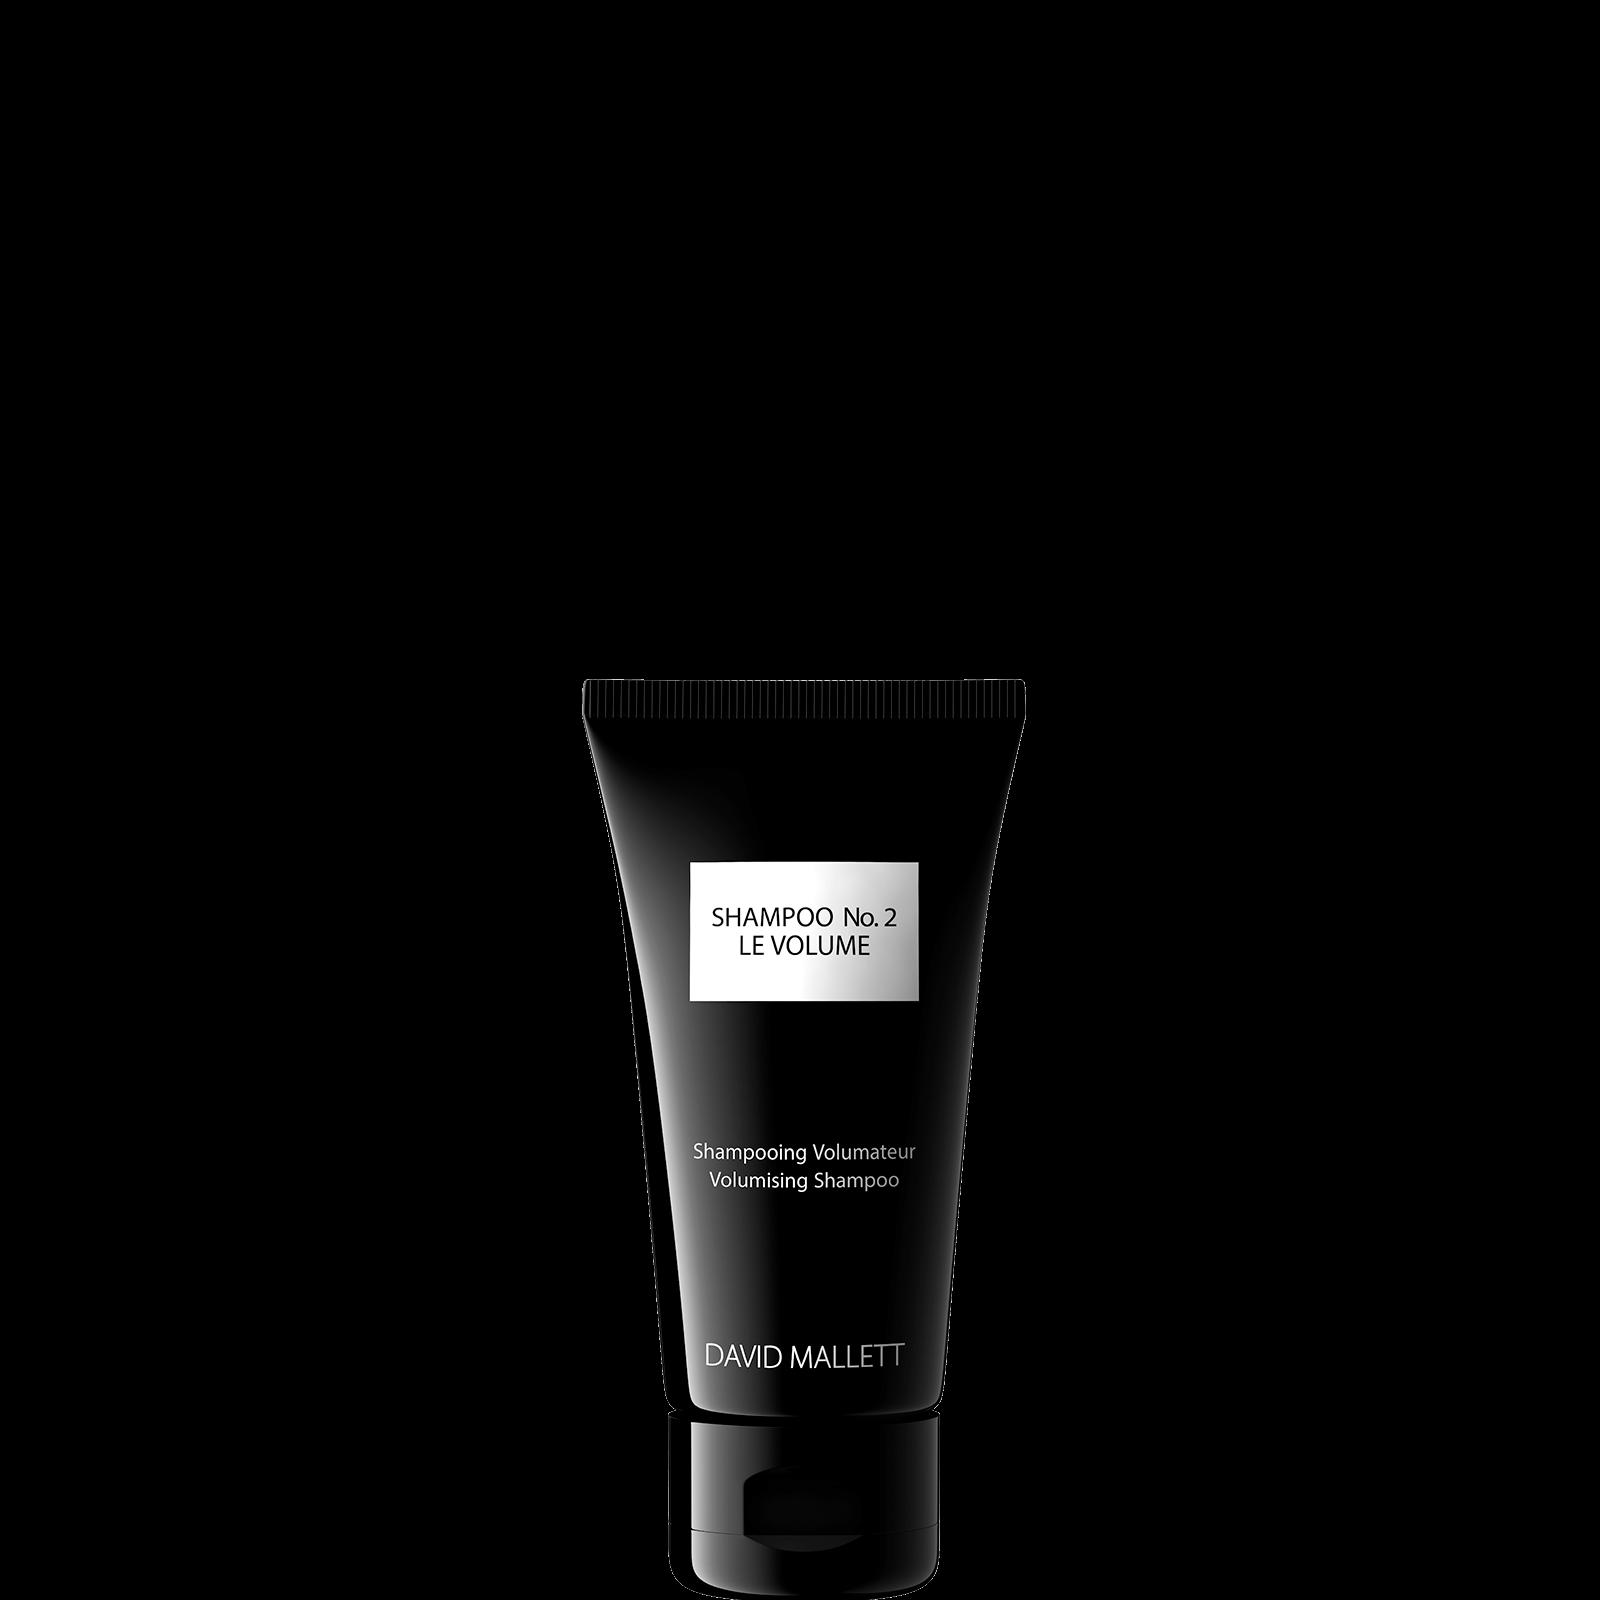 Image produit: Shampoo No. 2